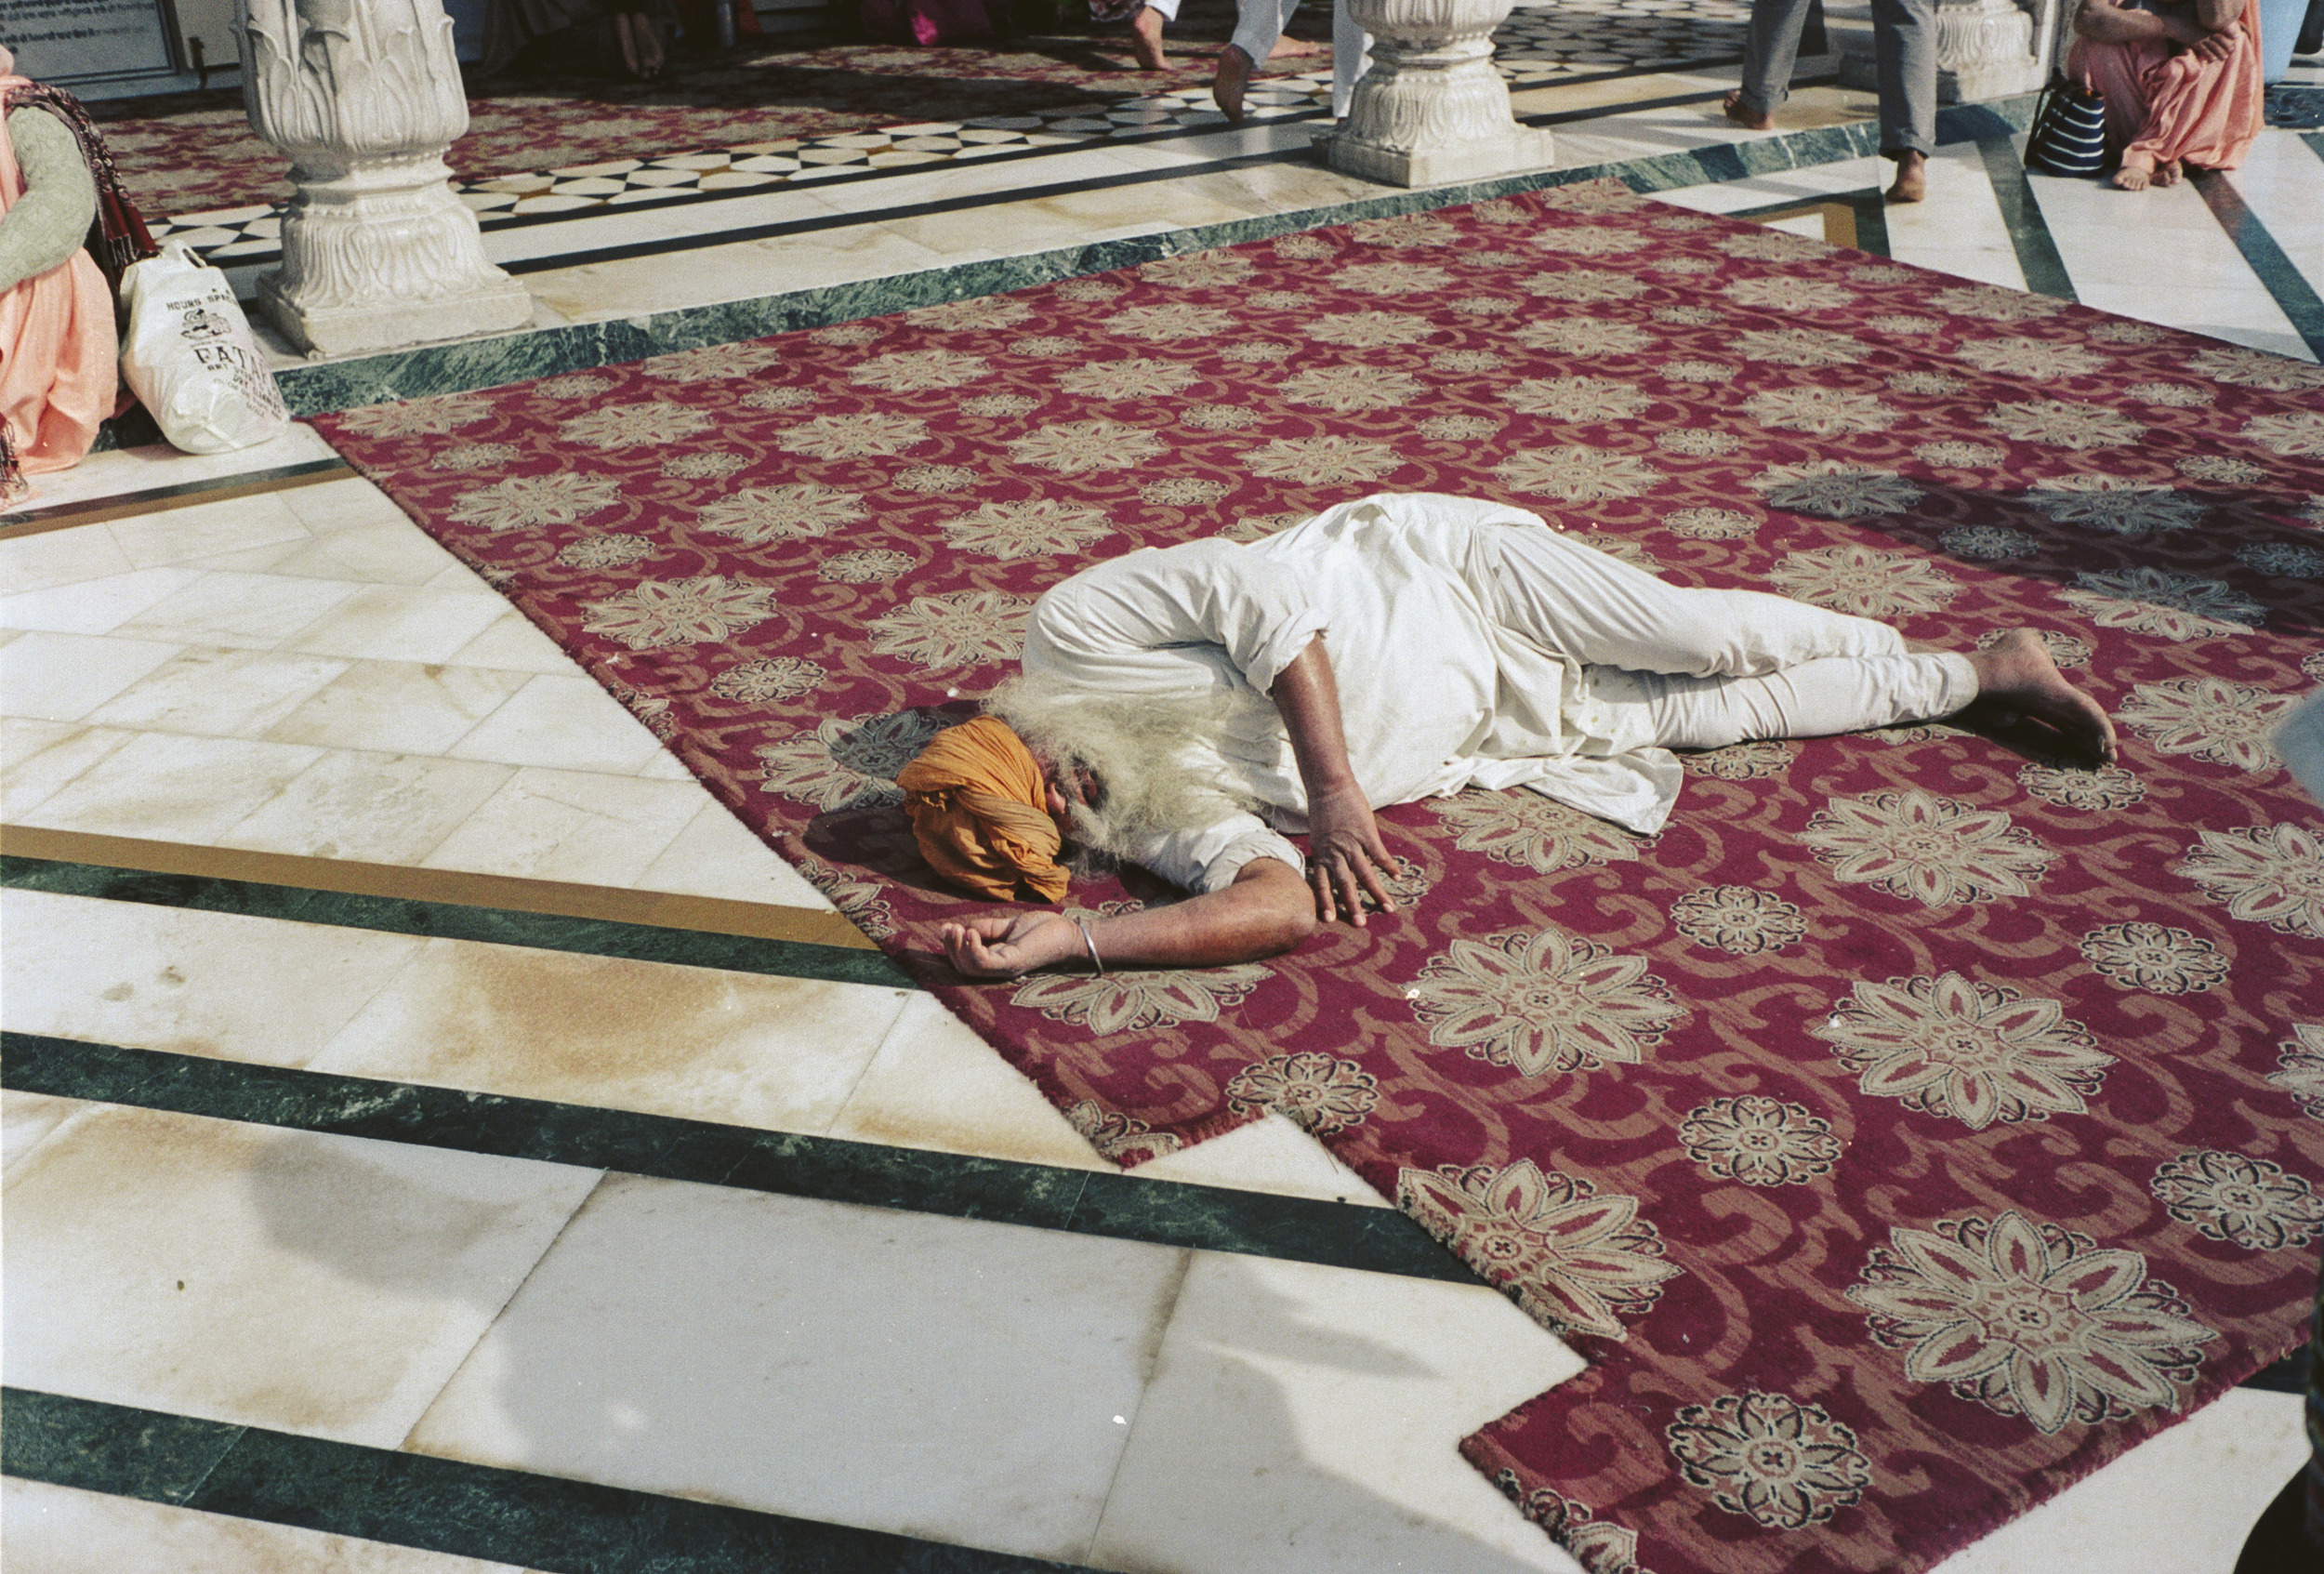 70-F9_Sleeping Man, Golden Temple, Amritsar, India 2016-52.jpg